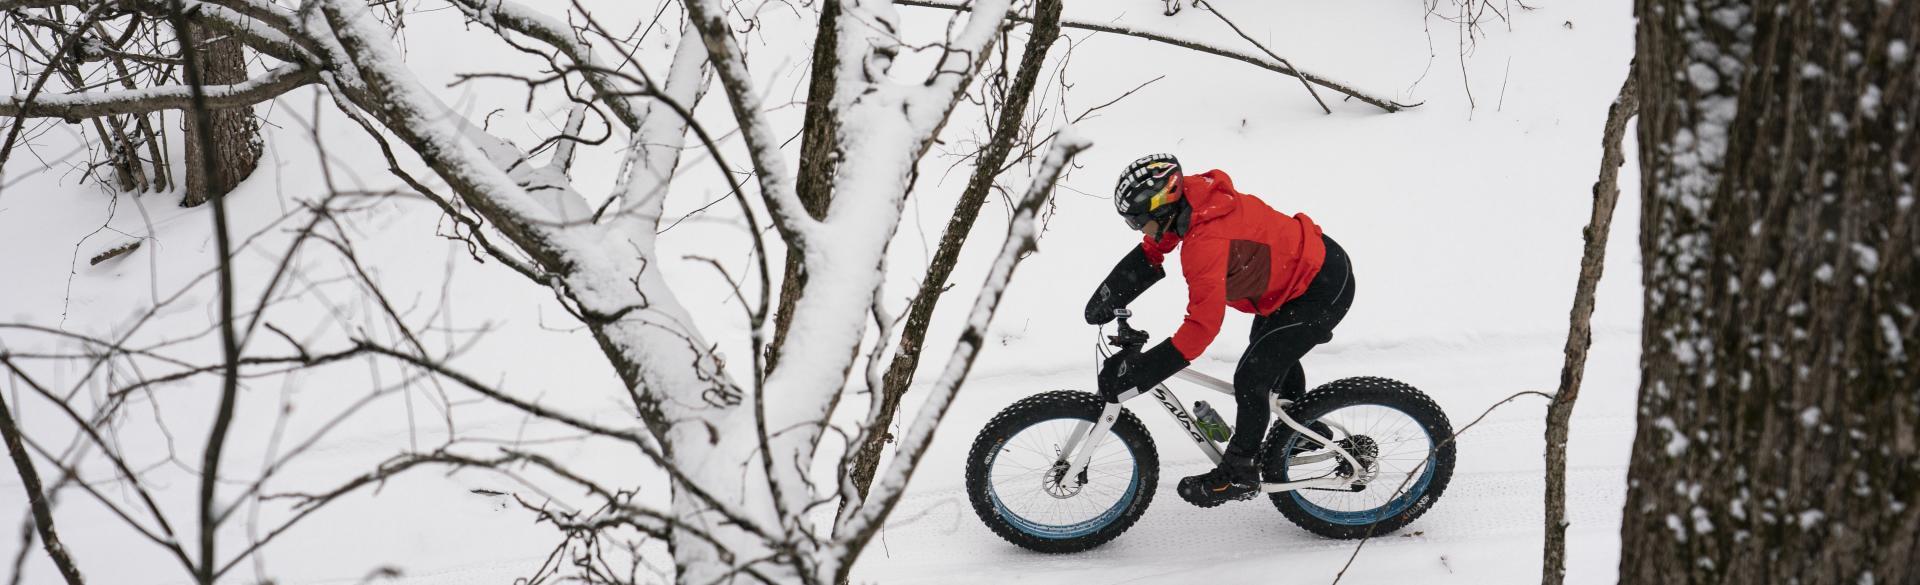 Riding a fat bike through wintry trails.